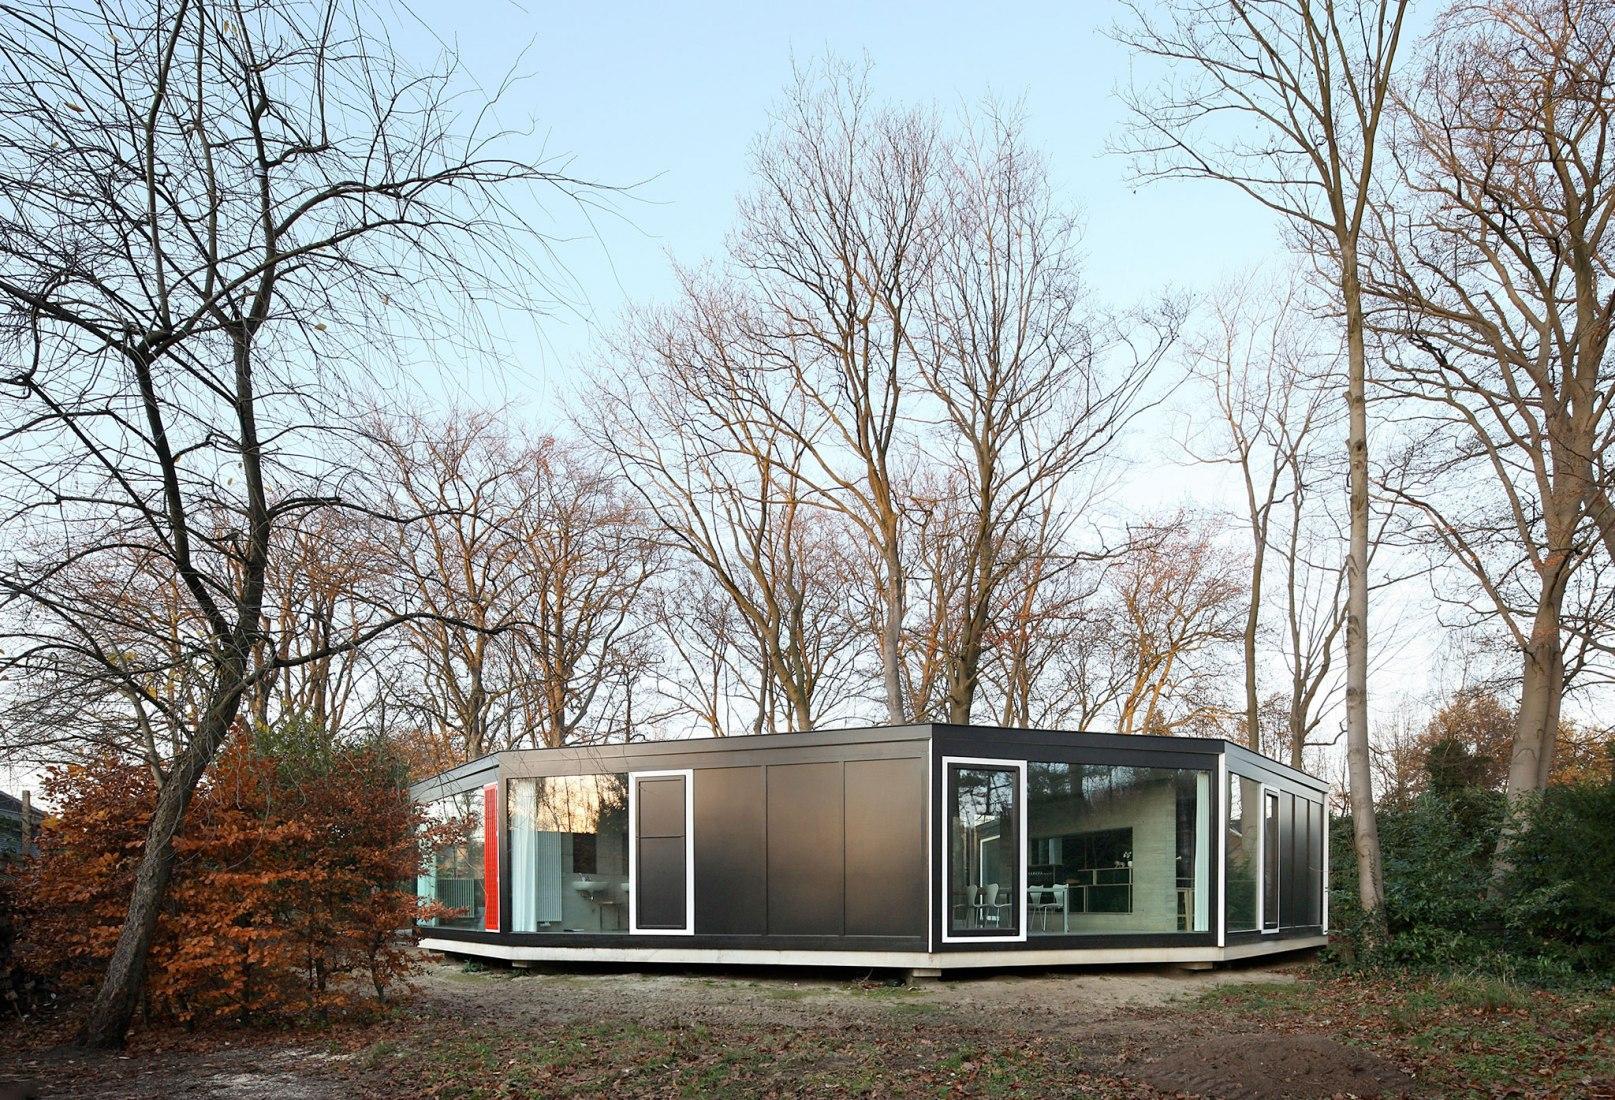 BM house by architecten de vylder vinck taillieu. Photograph by Filip Dujardin